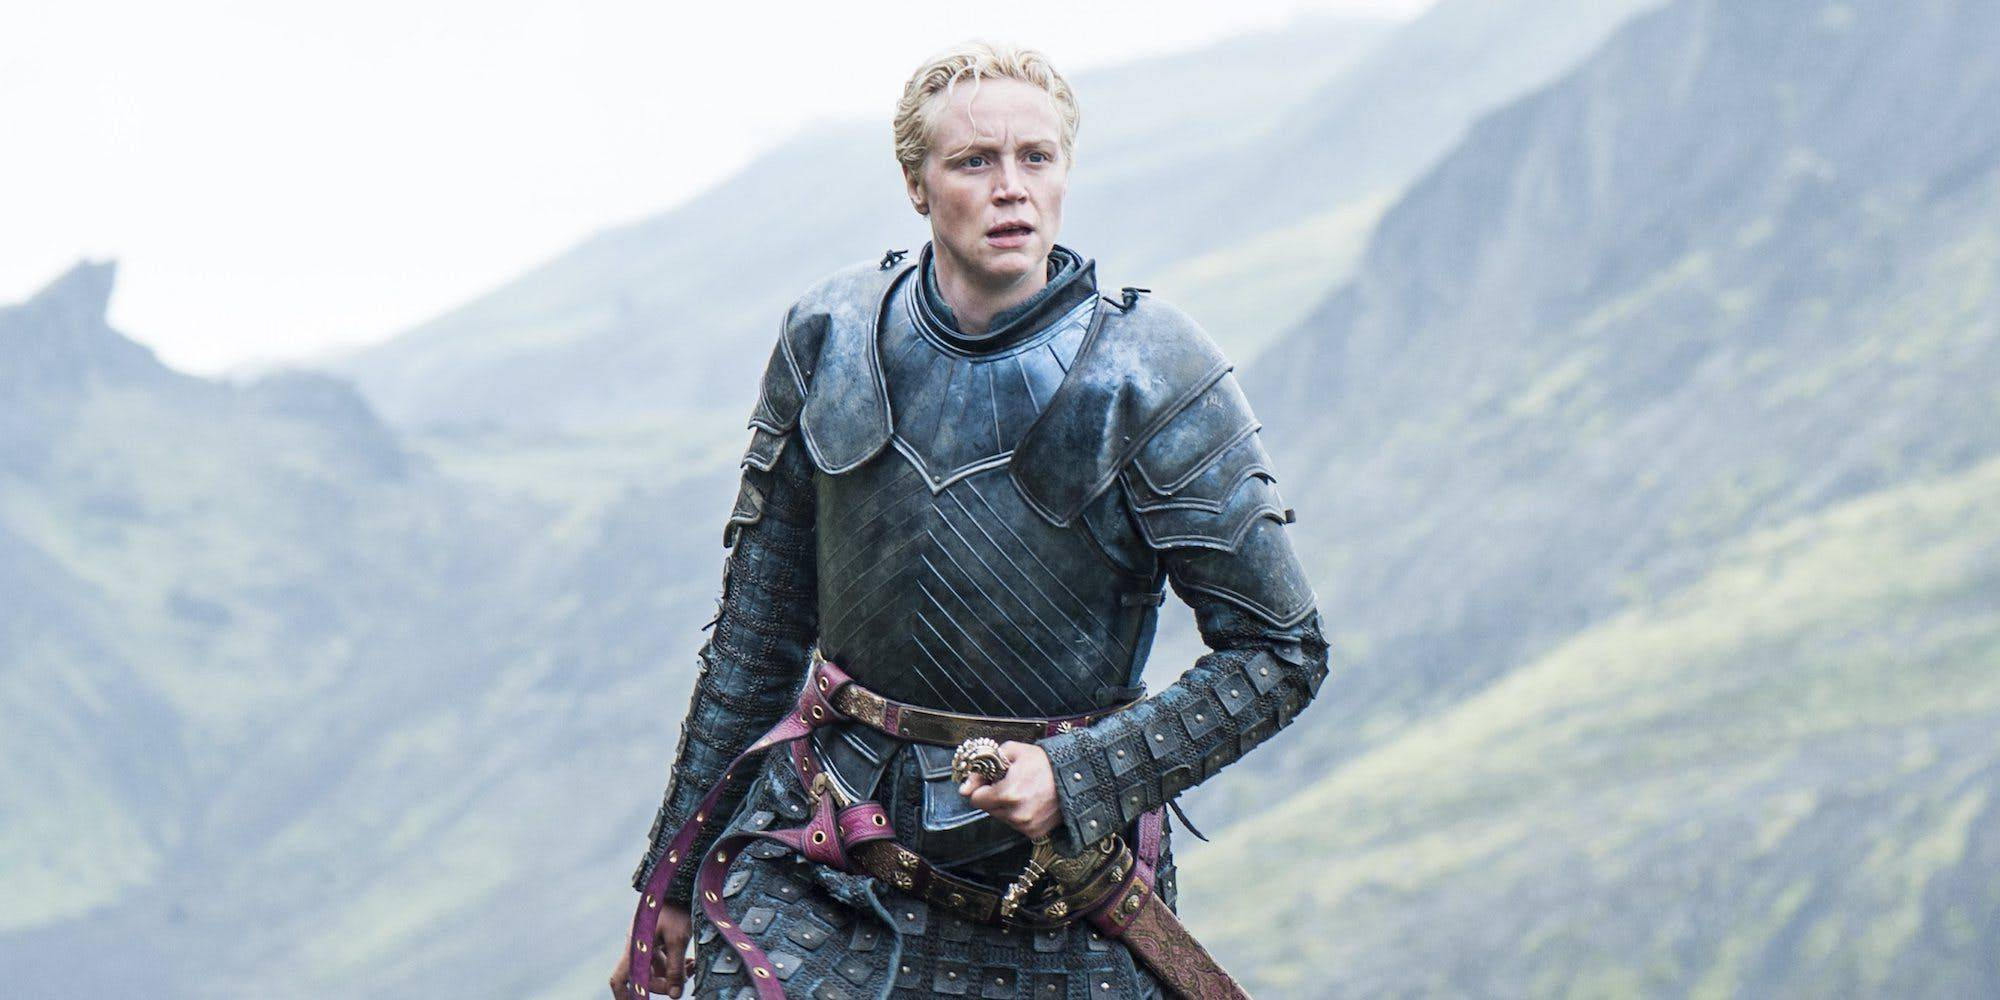 Game of Thrones Brienne of Tarth Unflavored Supplementation